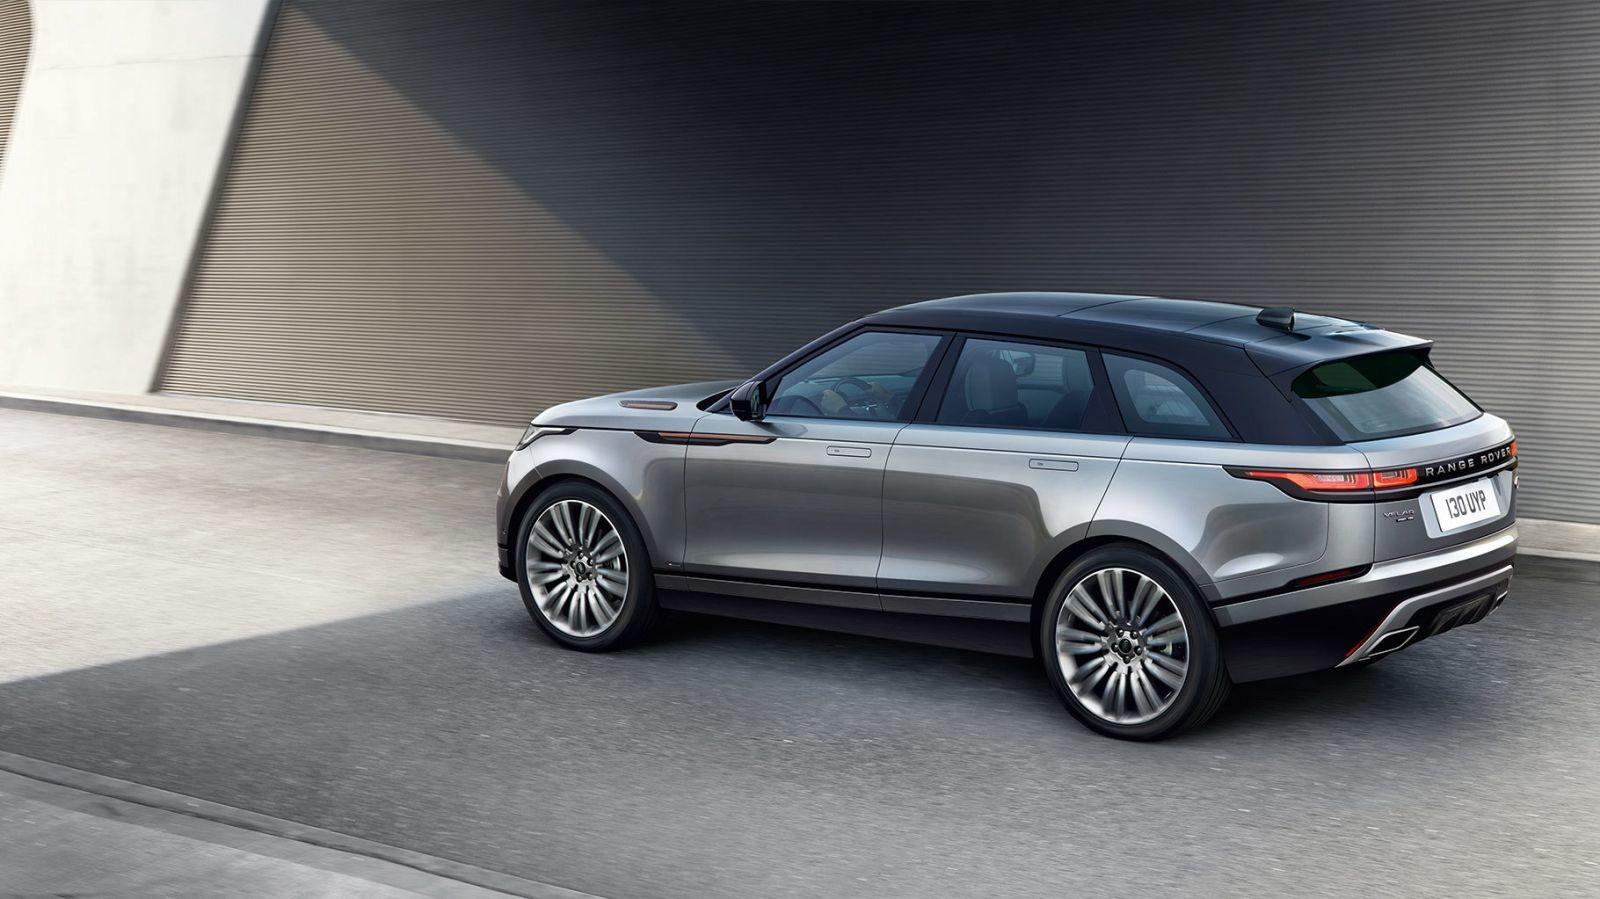 Range Rover Velar India Launch In 2017? | Motoroids